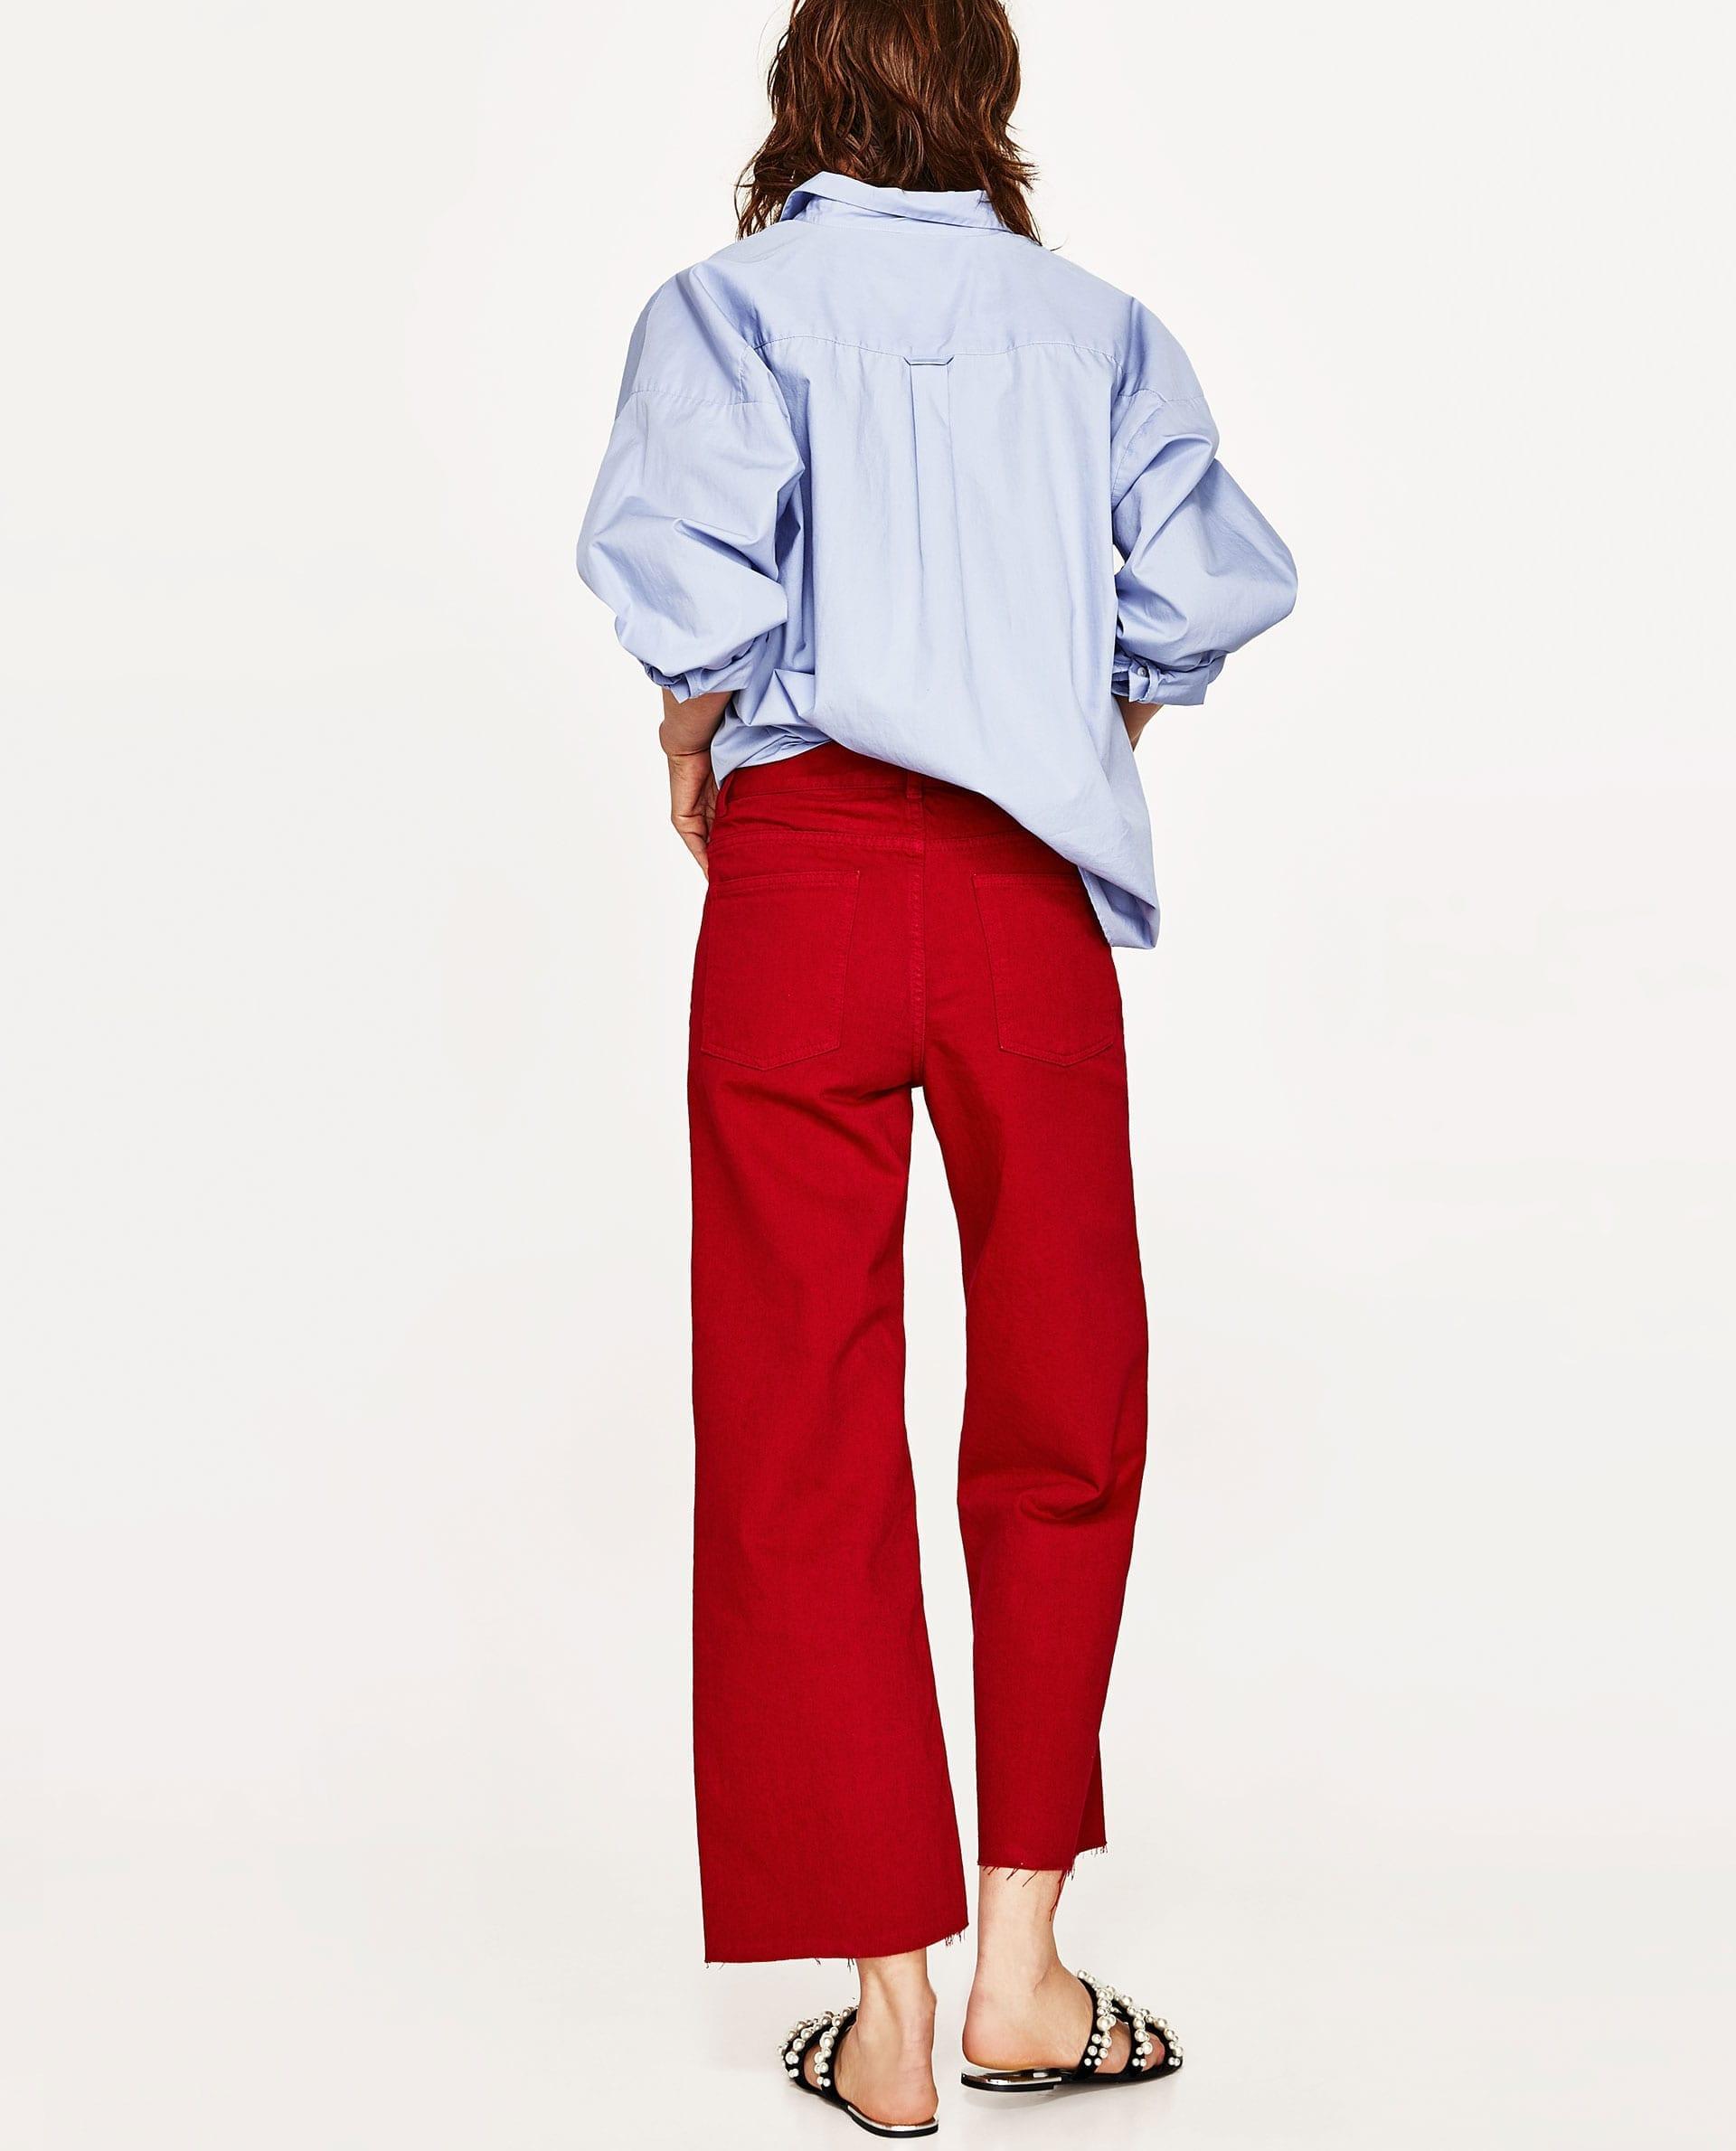 Jeans femminili più belli, Jeans femminili più belli, theladycracy.it, elisa bellino, fashion blog, fashion blogger italiane 2017, fashion blogger famose 2017, blogger moda 2017, blog moda 2017, blogger moda italiane 2017, blogger moda più seguite 2017, jeans zara, jeans mango, che jeans comprare,